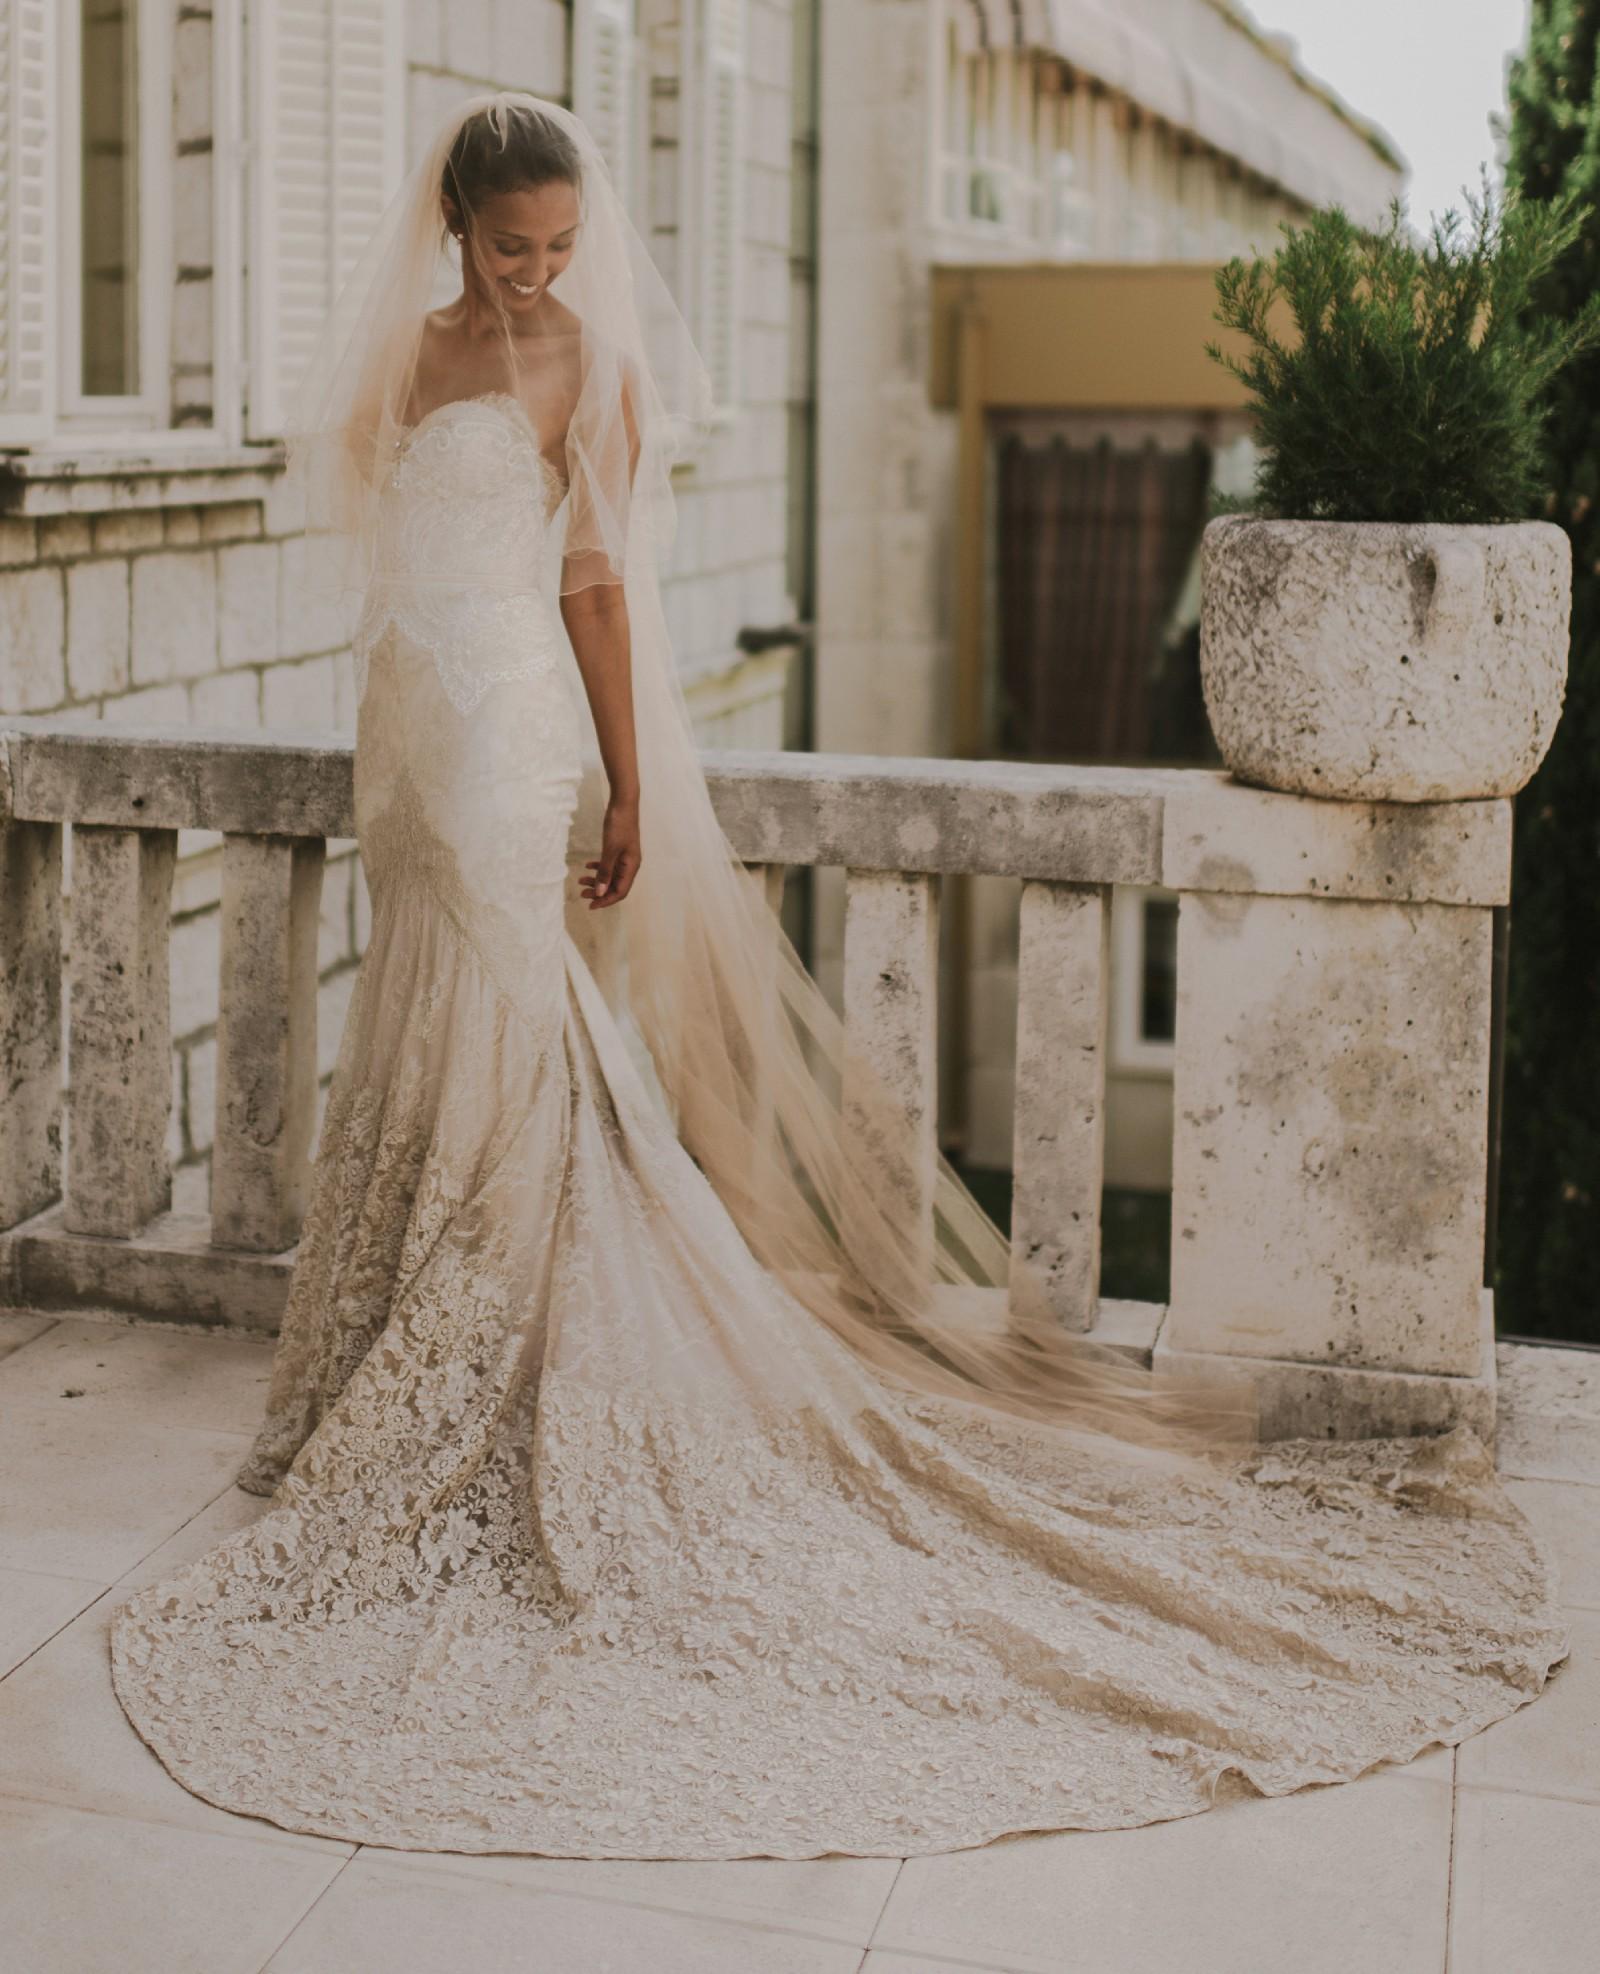 Inbal Dror Wedding Gowns: Inbal Dror Custom Made 14-10 Used Wedding Dress On Sale 49